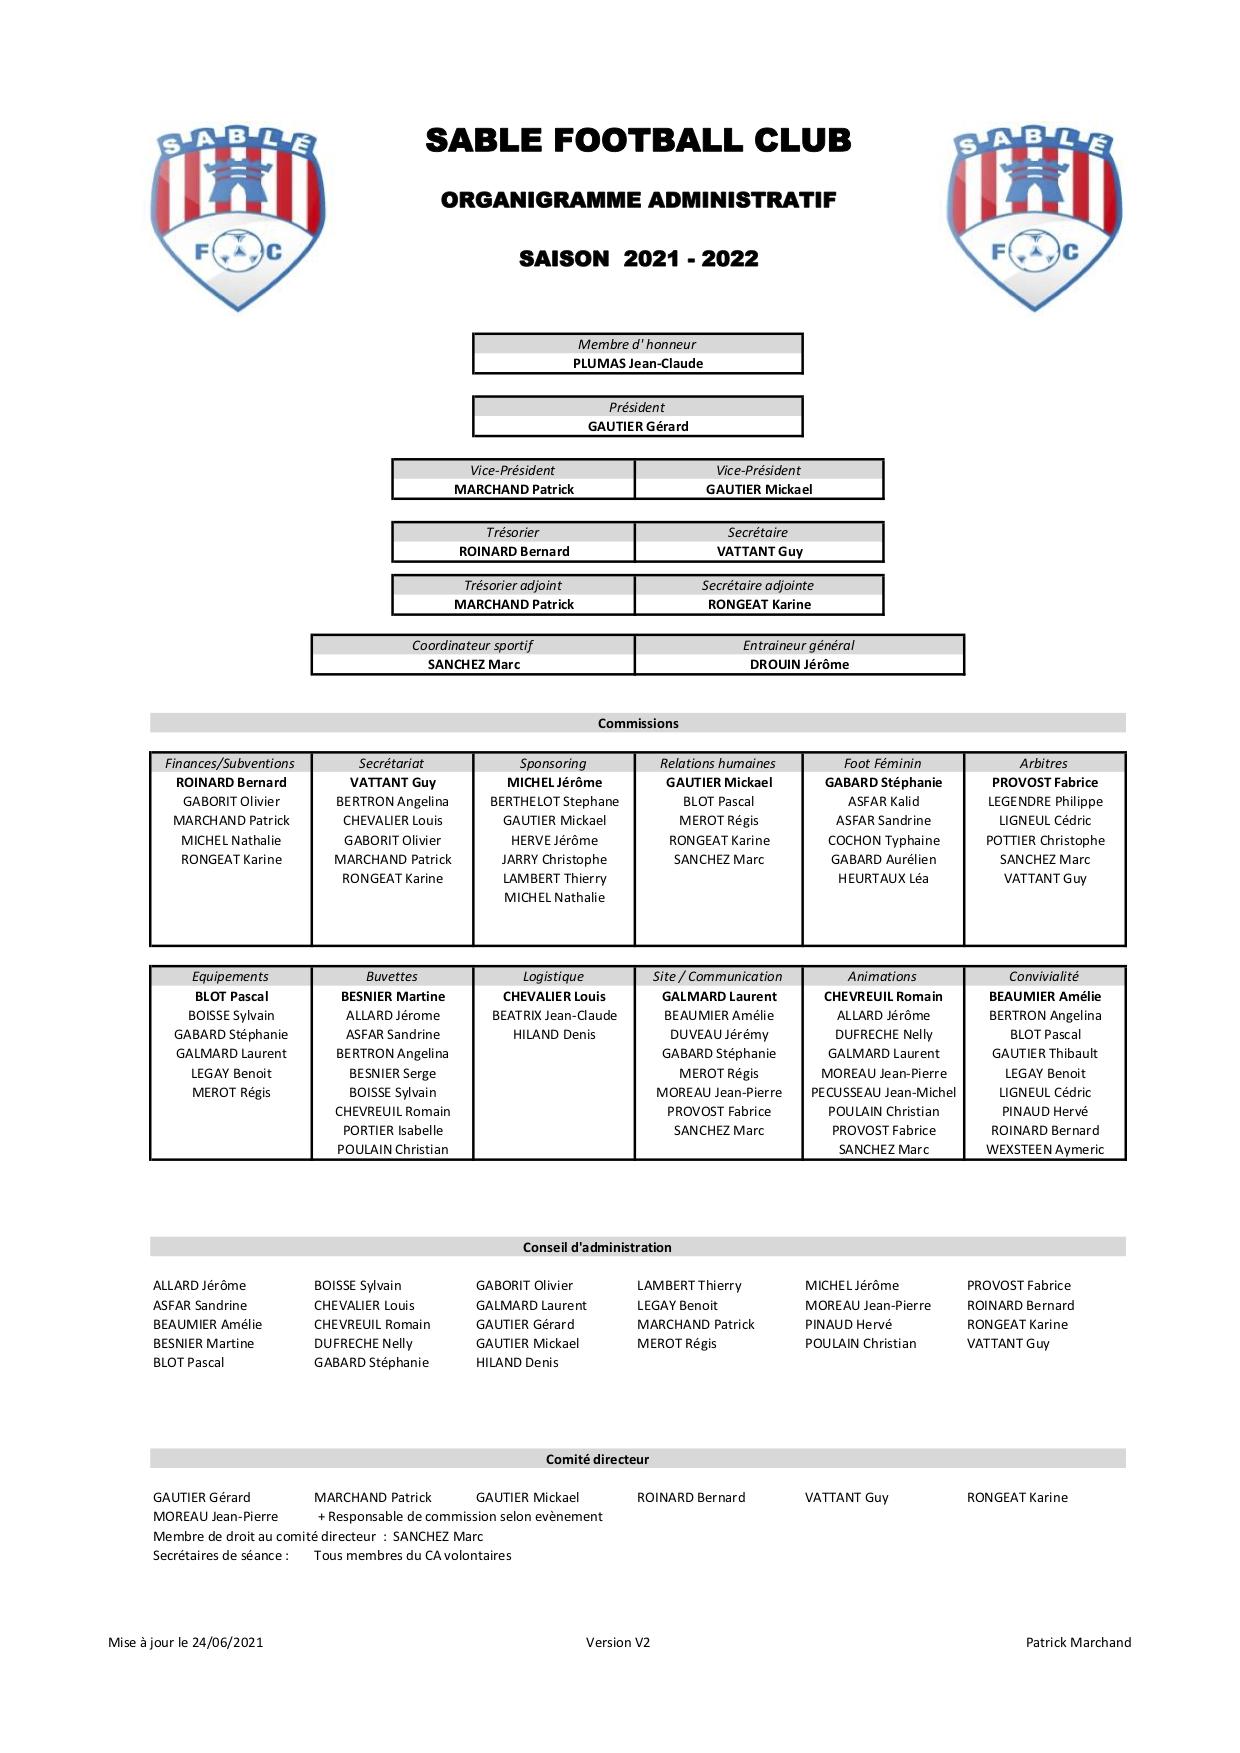 Organigramme administratif 2021 - 2022.png